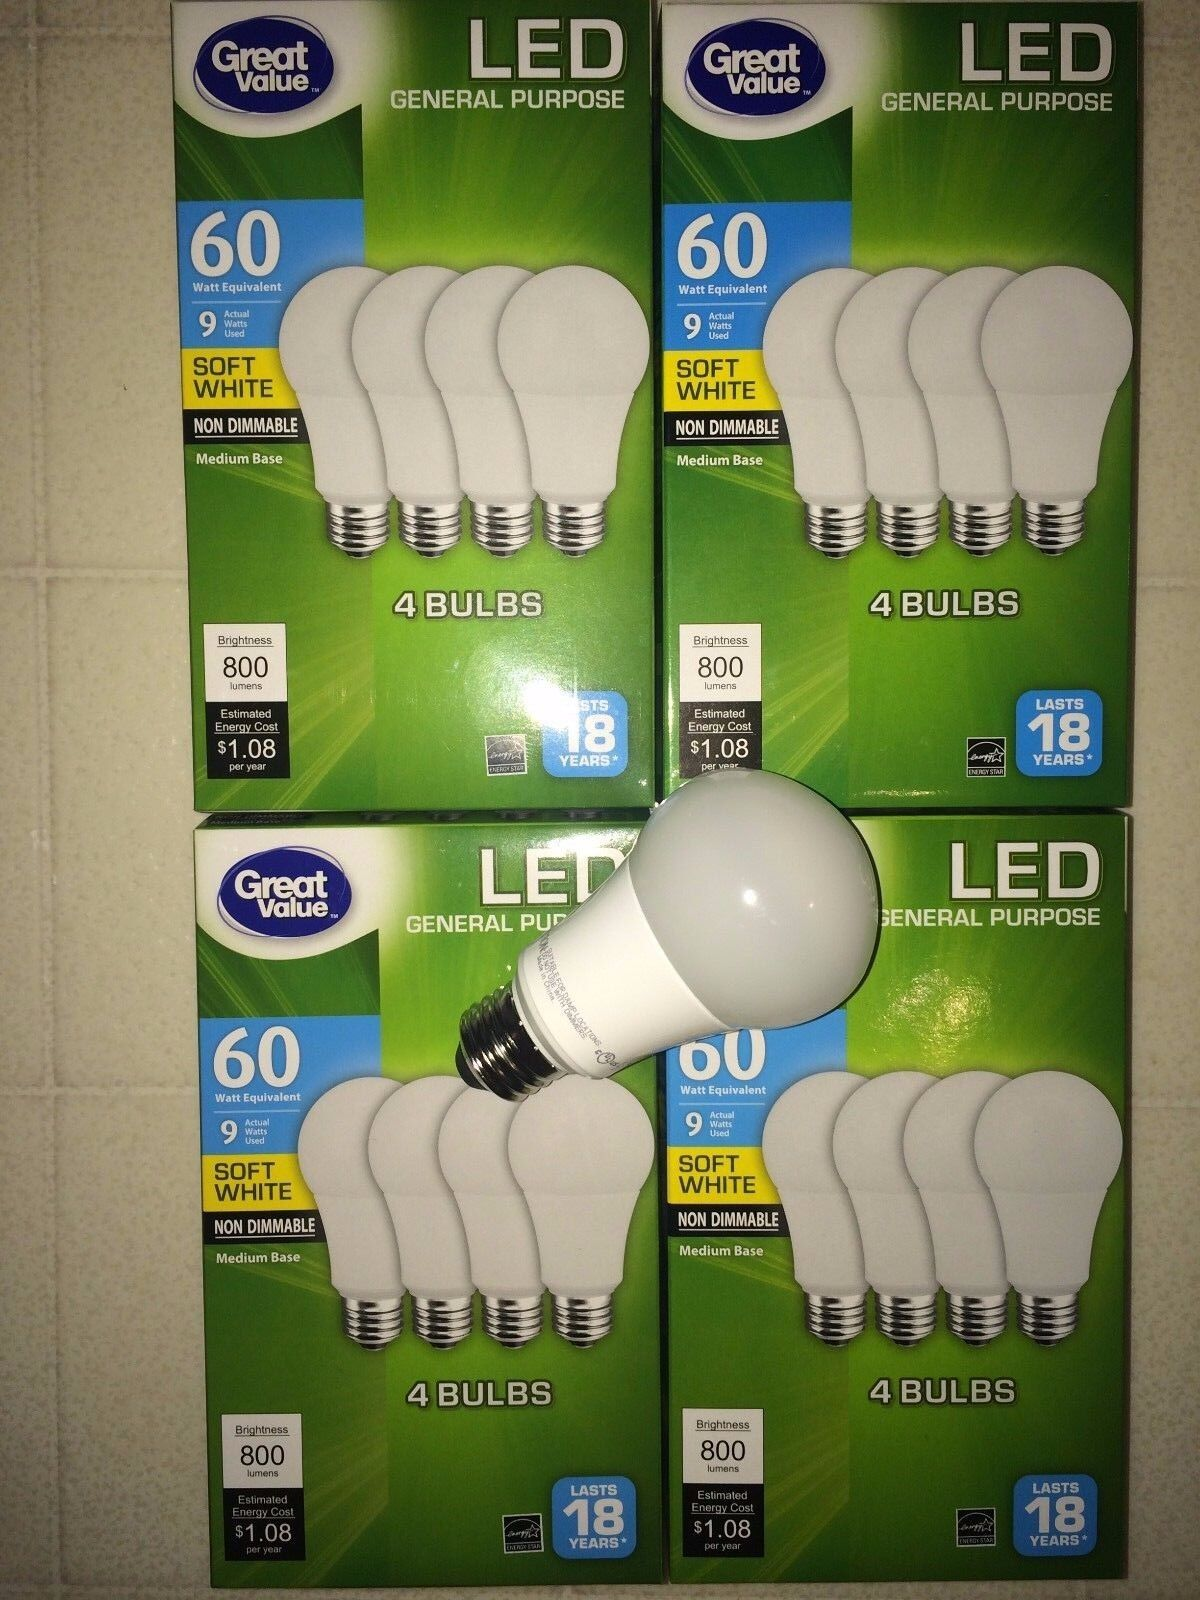 Great Value LED Light Bulb, 9W 60W Equivalent, Soft White, 4